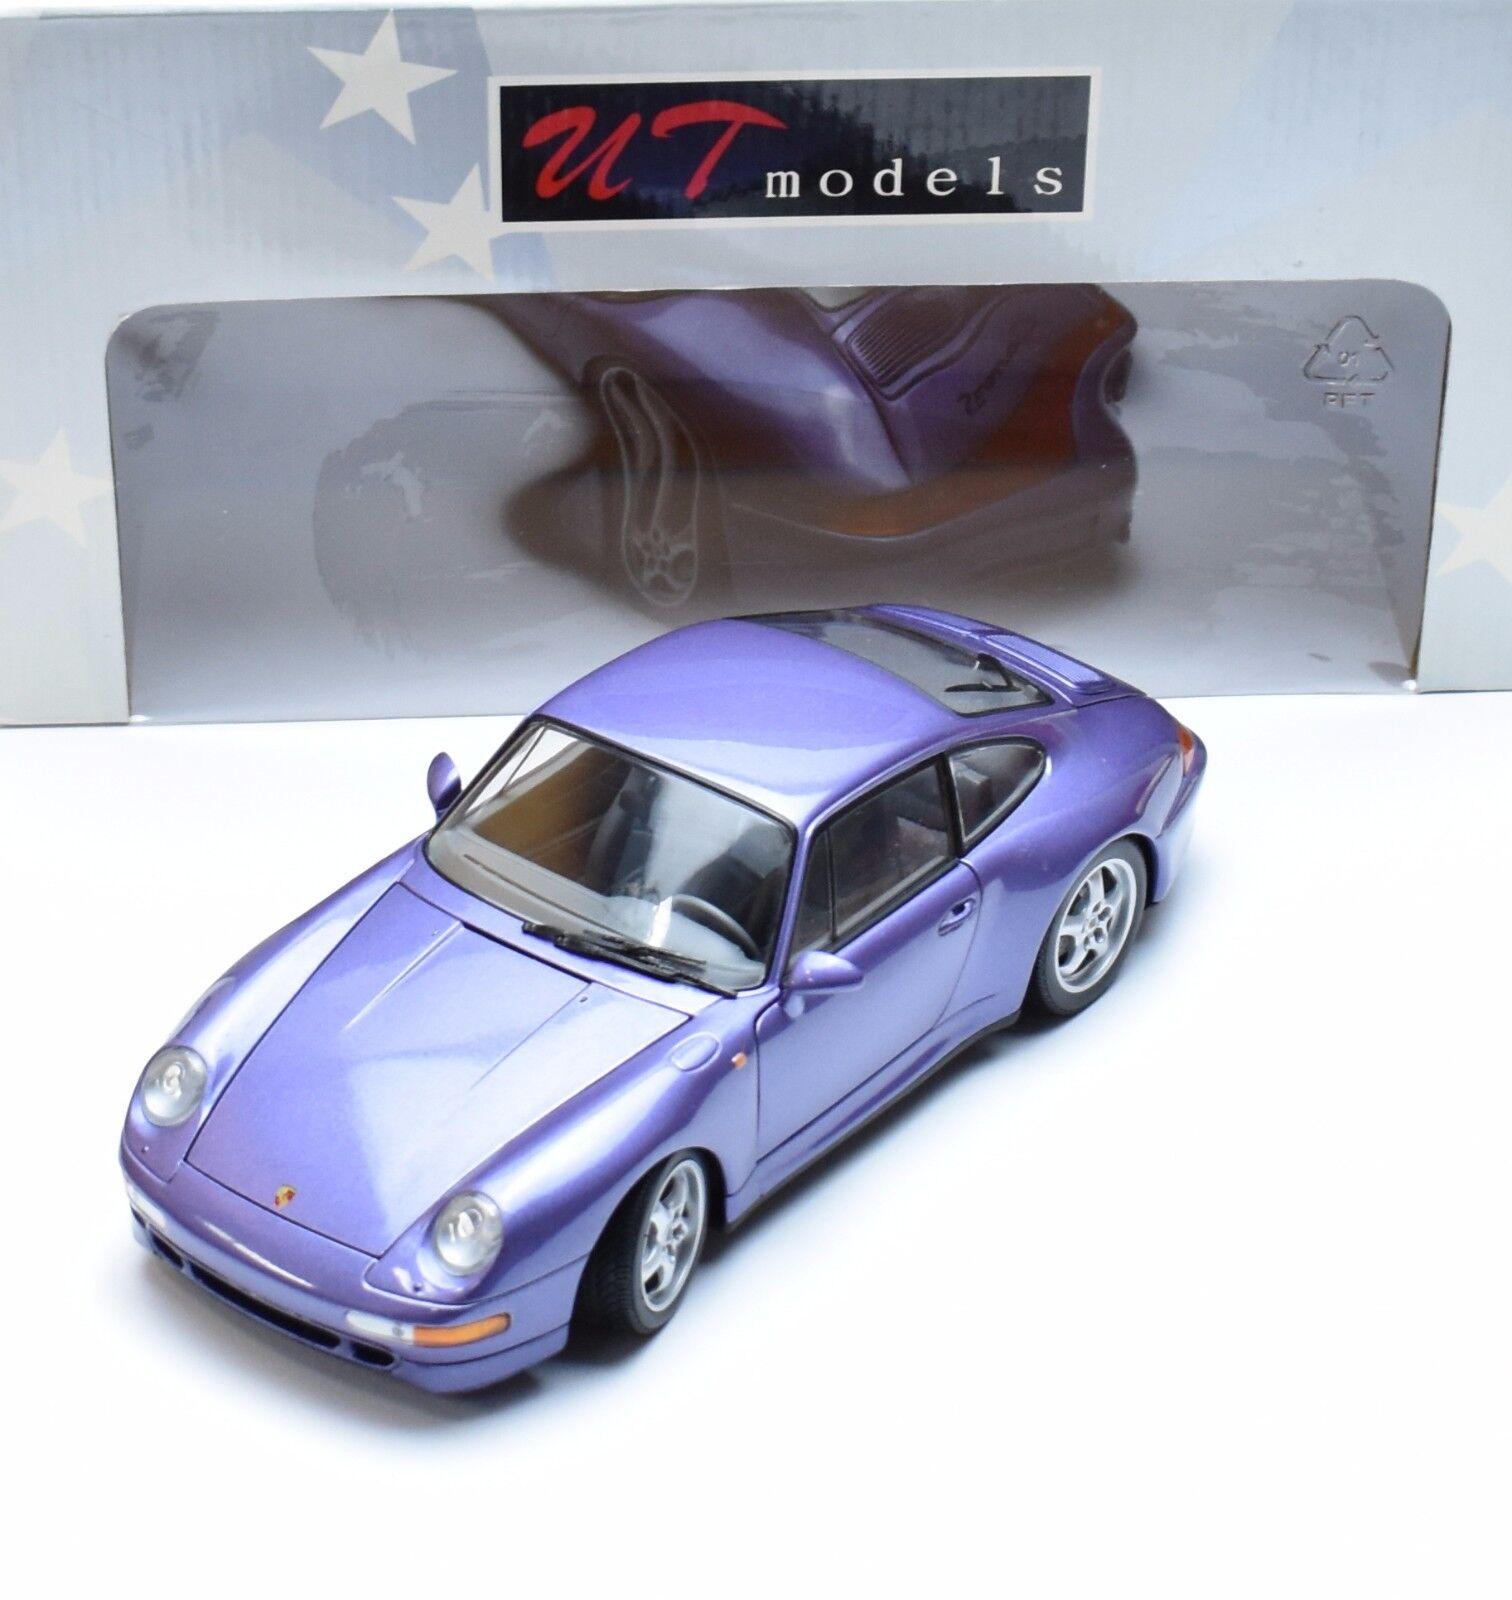 UT voiture de sport PORSCHE 911 CARRERA S Violet Metallic laqué, 1 18, NEUF dans sa boîte, k011